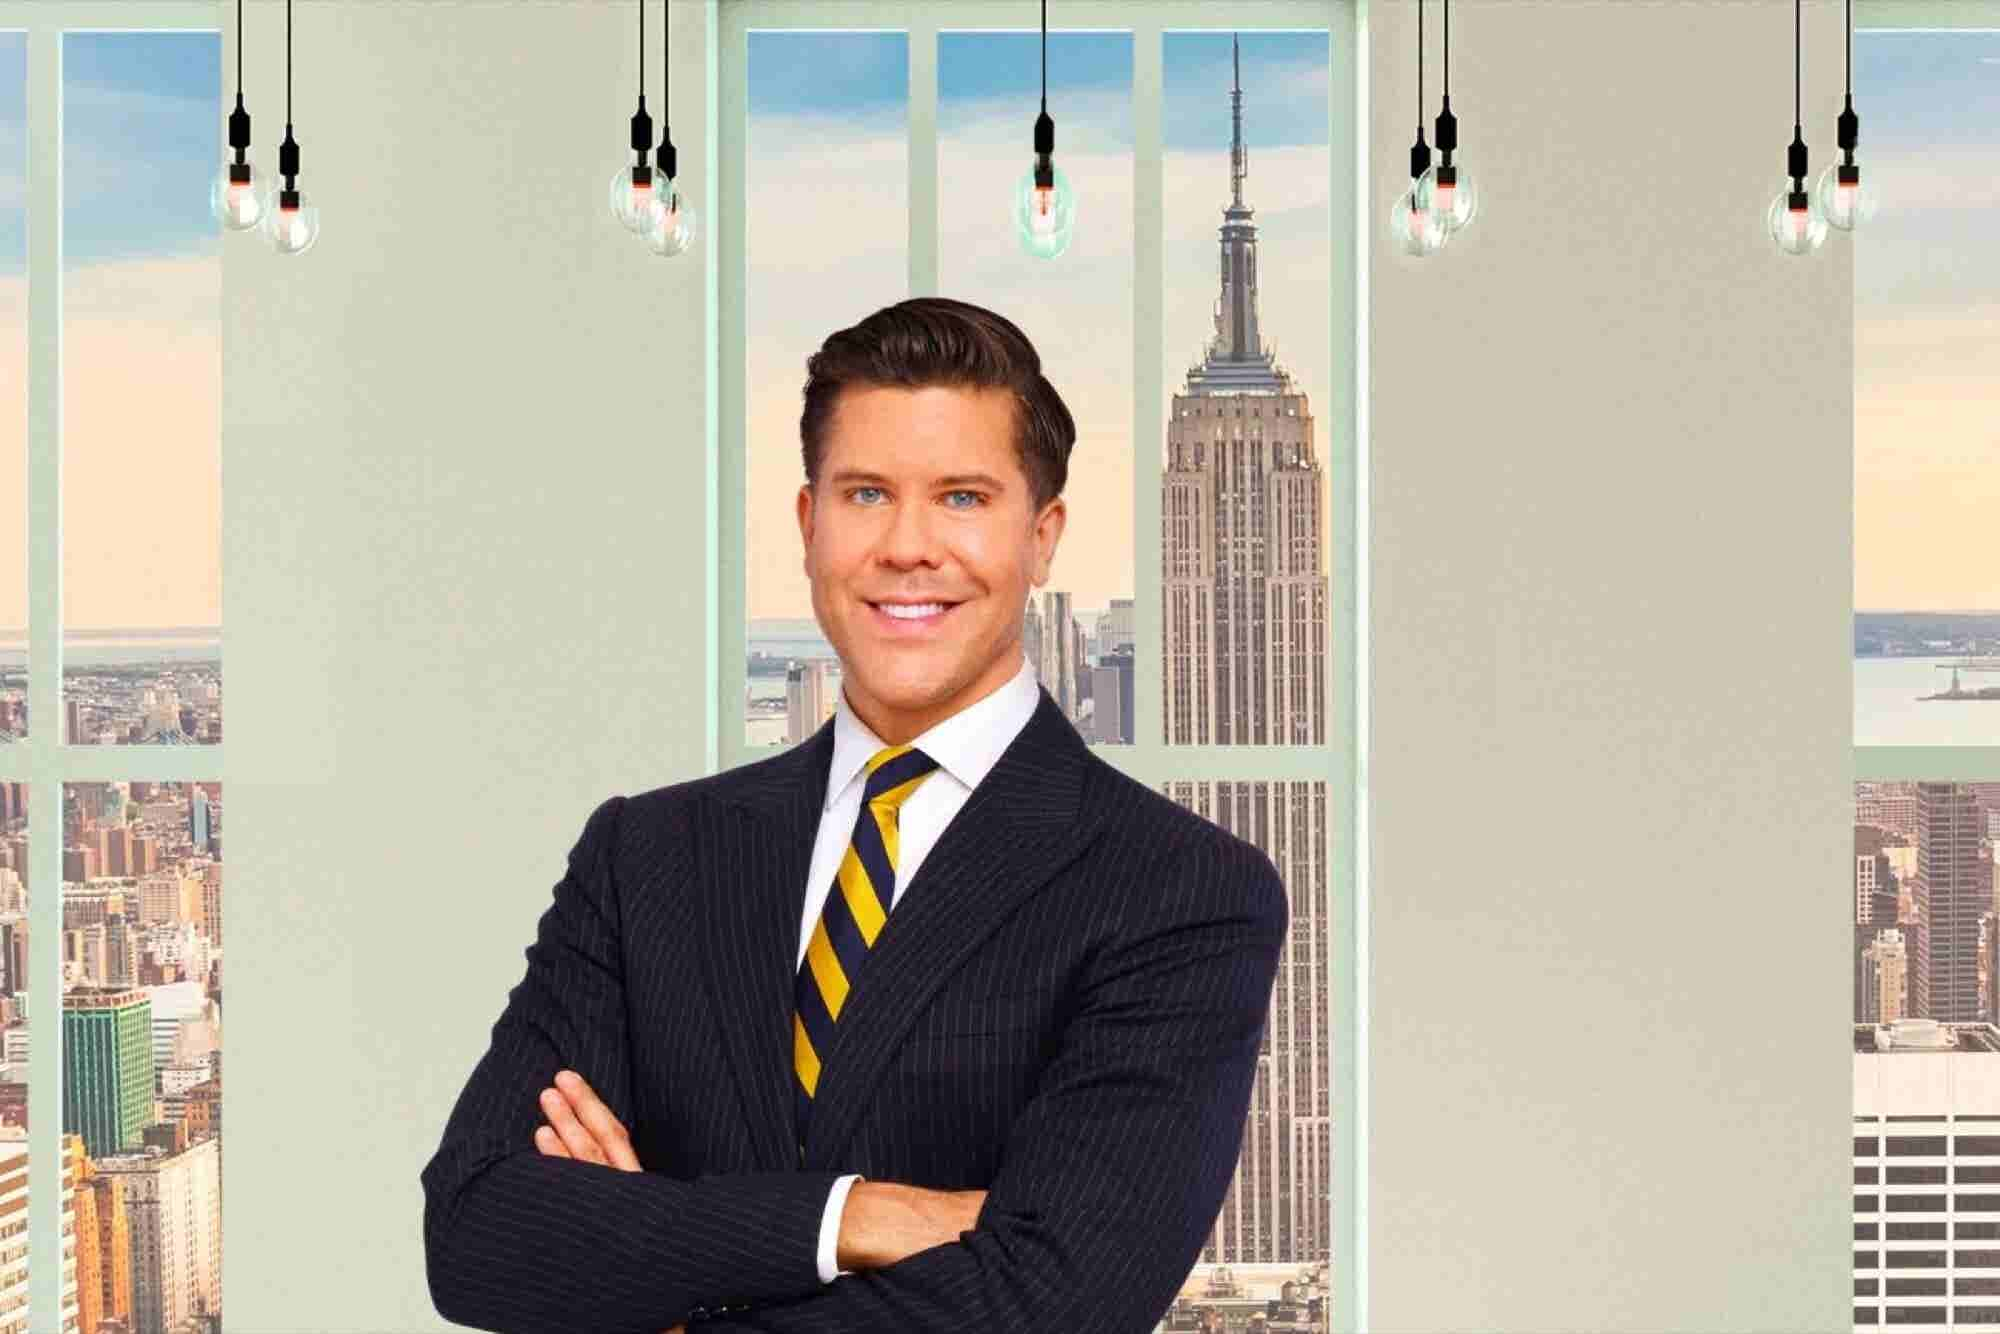 4 Ways This Millionaire Tames Difficult Clients